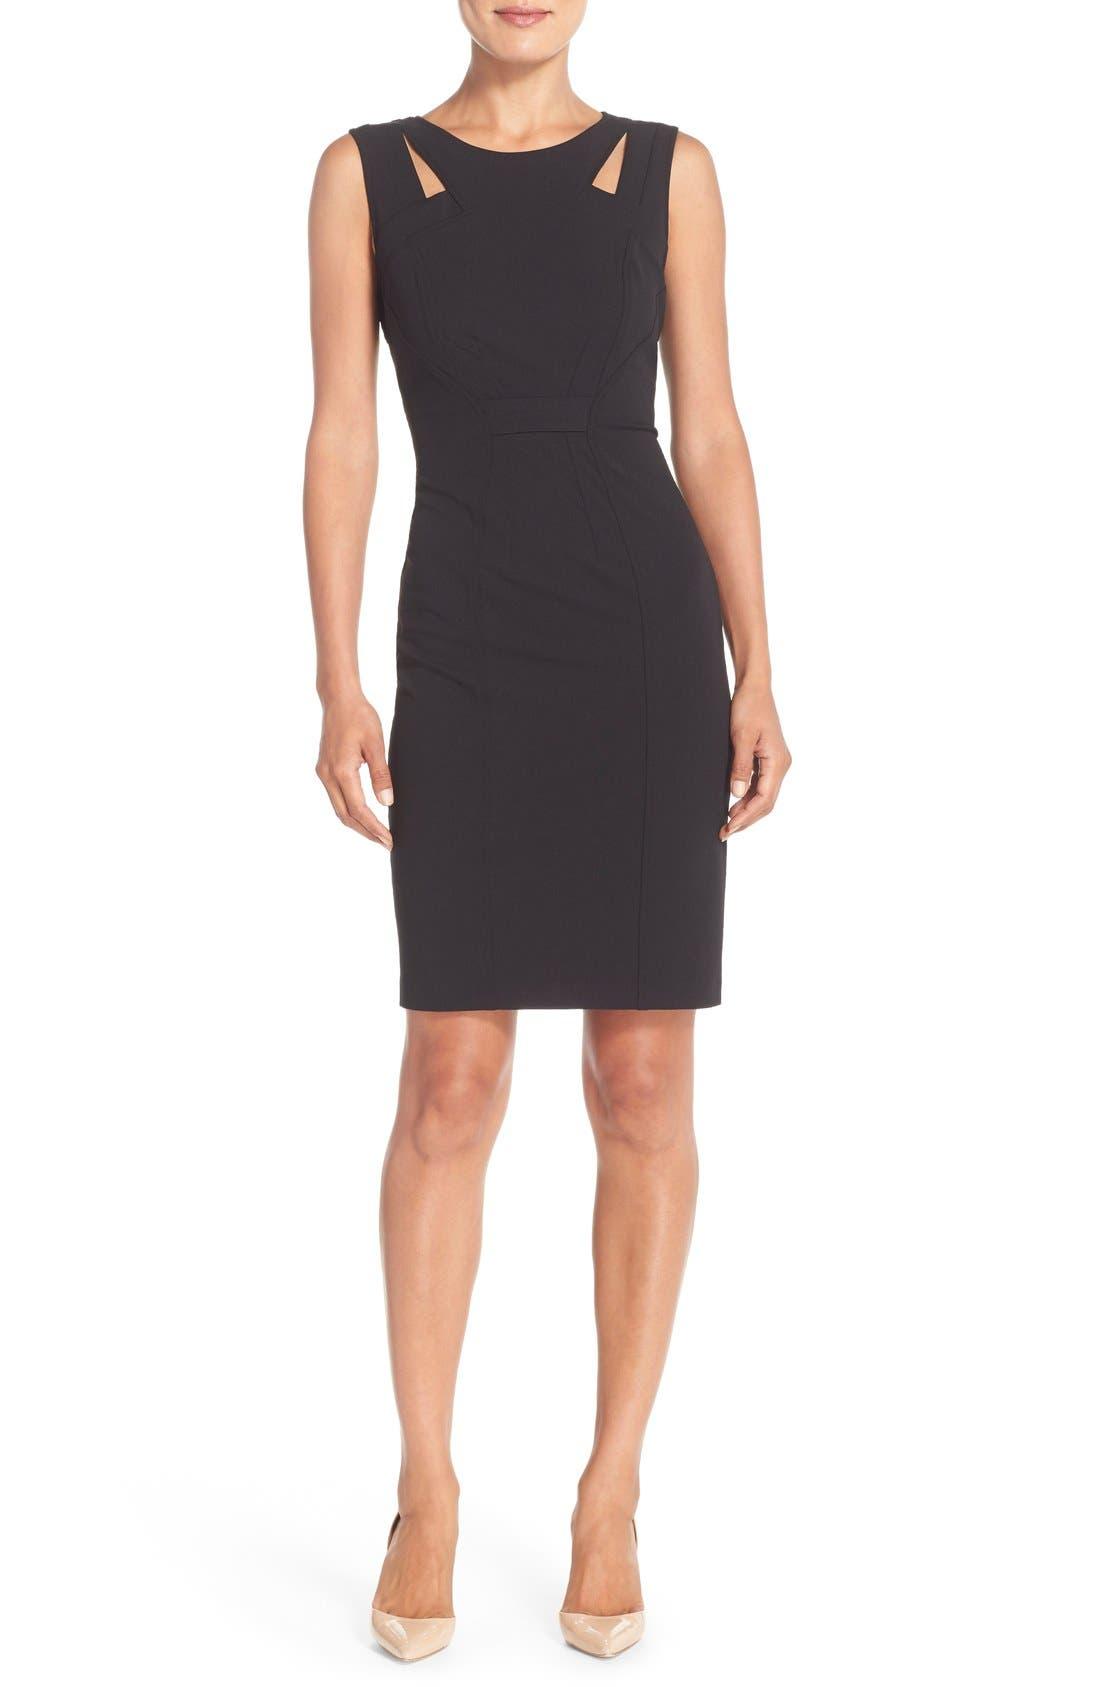 Alternate Image 1 Selected - NYDJ Cutout Shoulder Crepe Sheath Dress